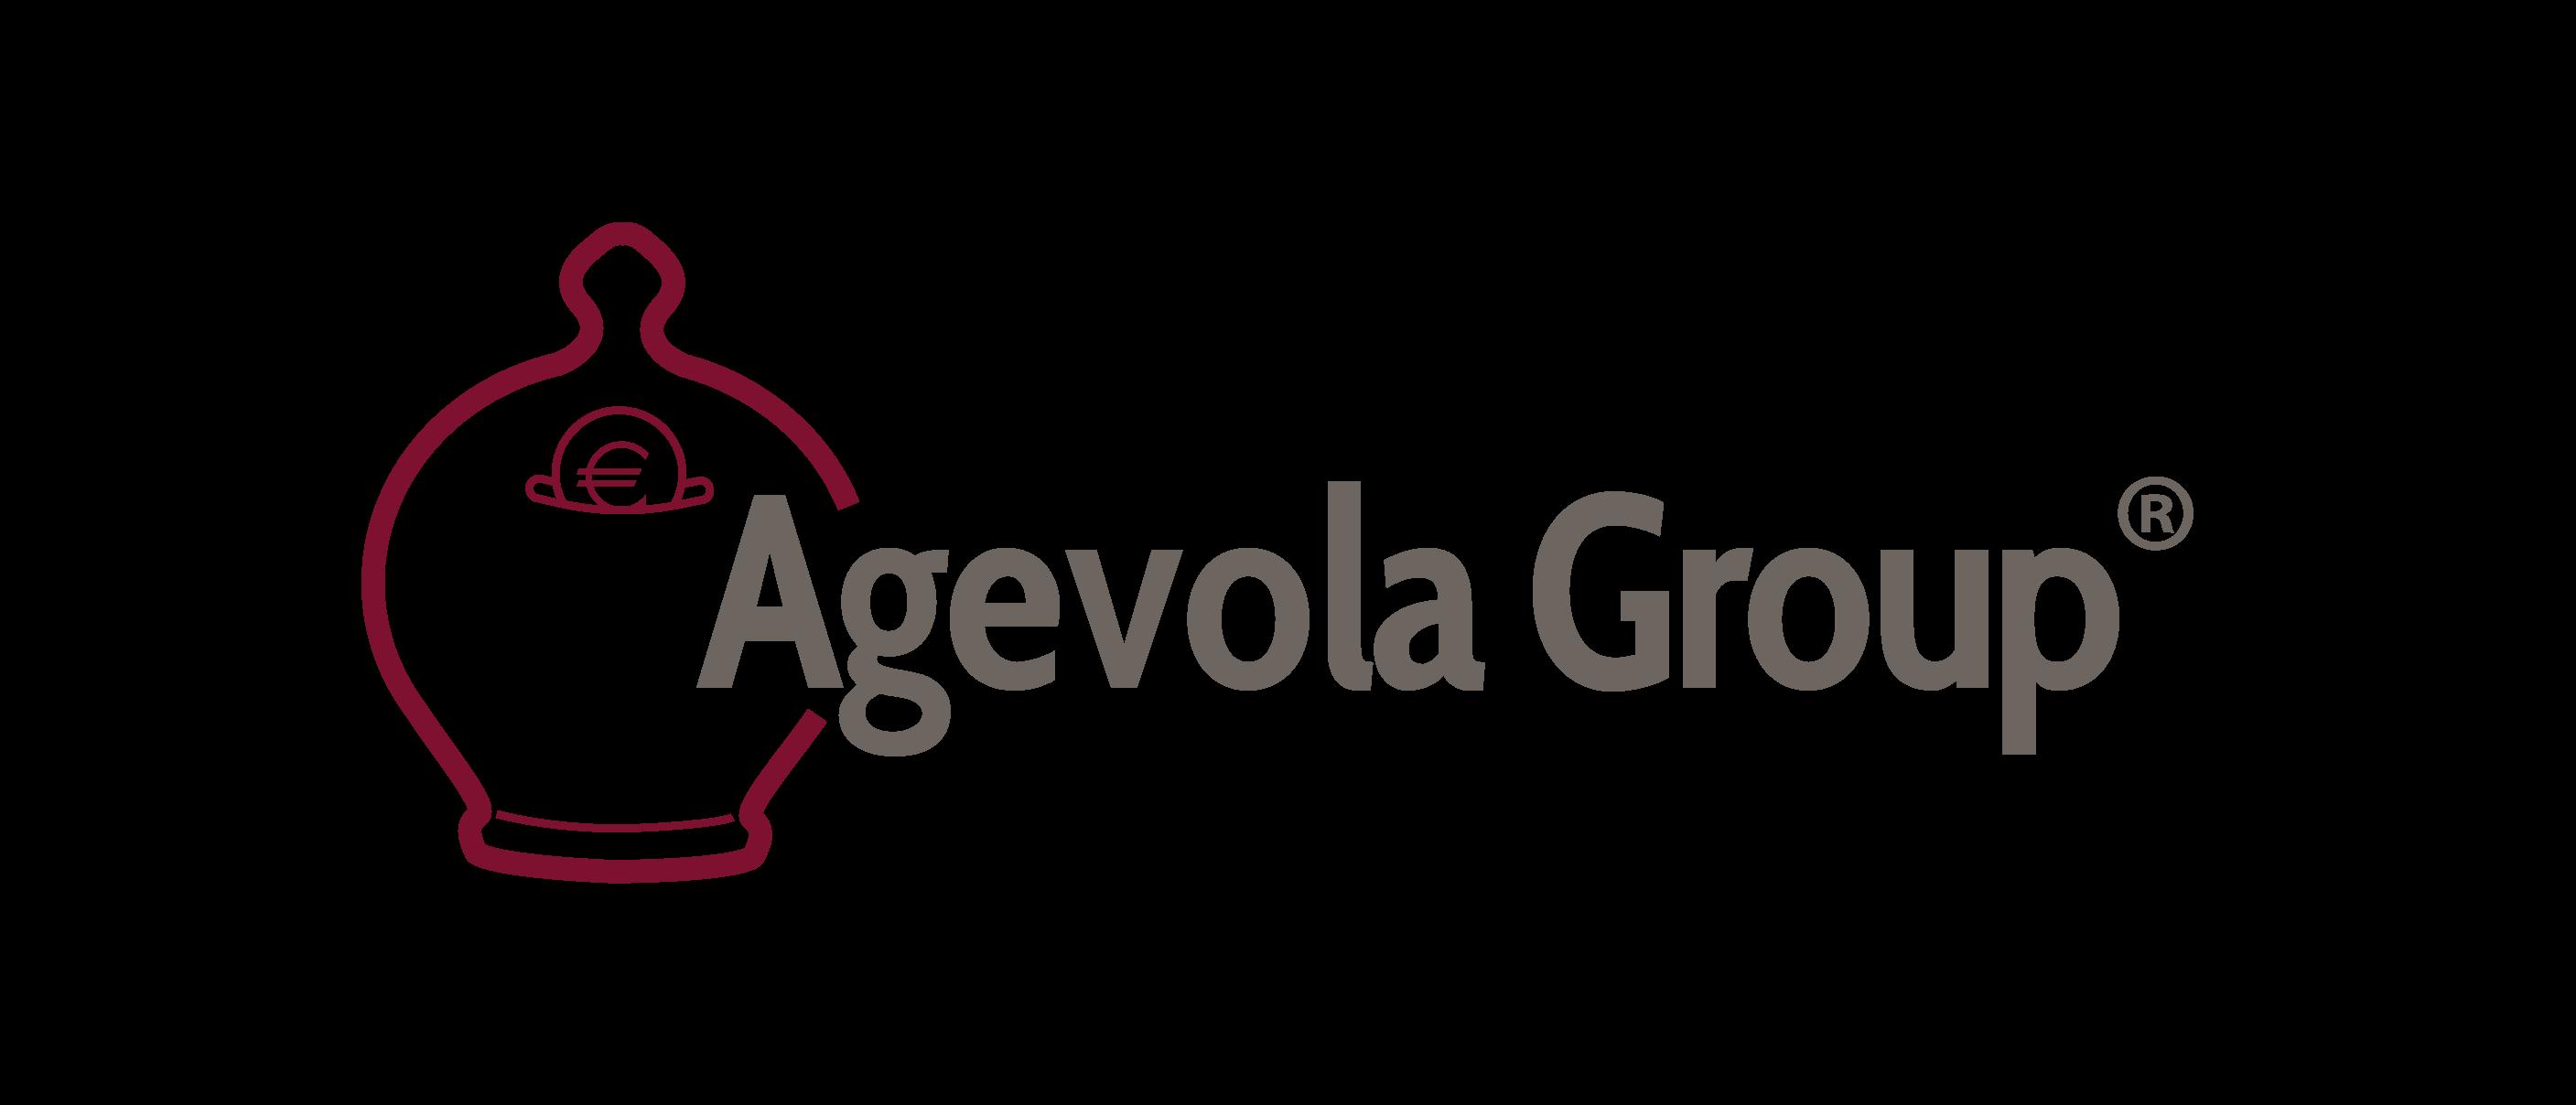 Agevola Group logo